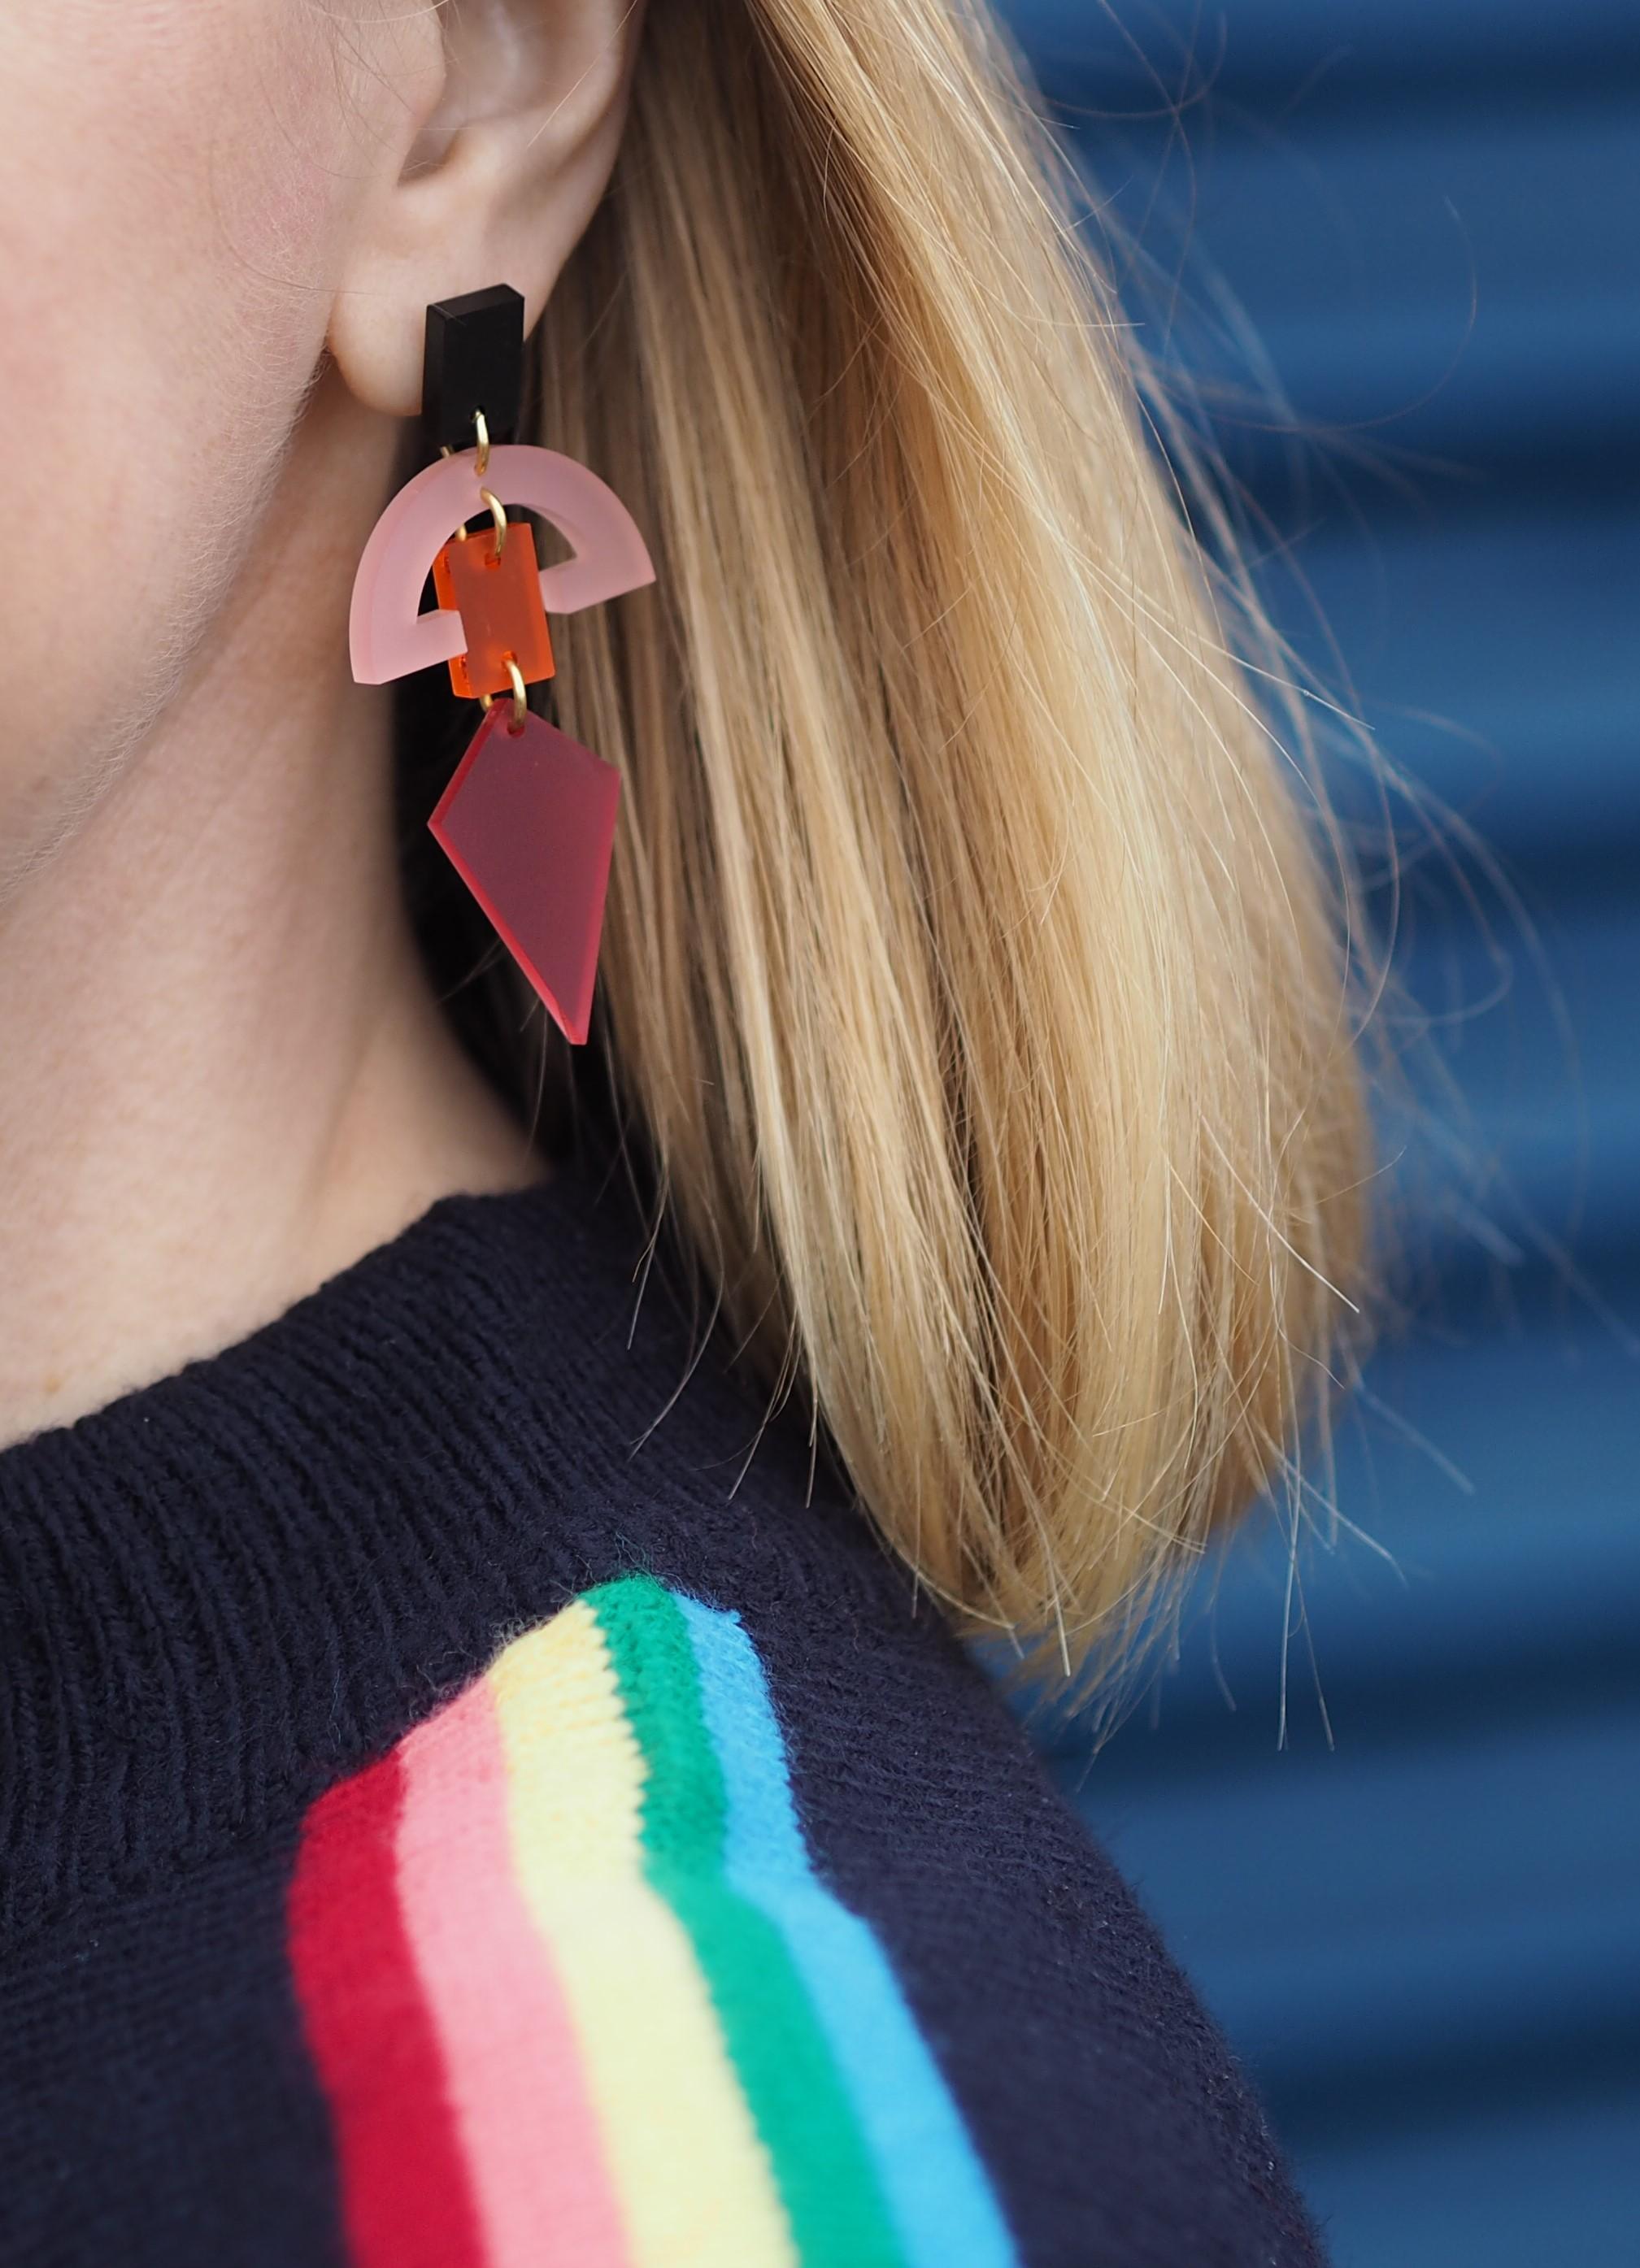 Pink half moon earrings worn with rainbow-stripe sleeve sweater